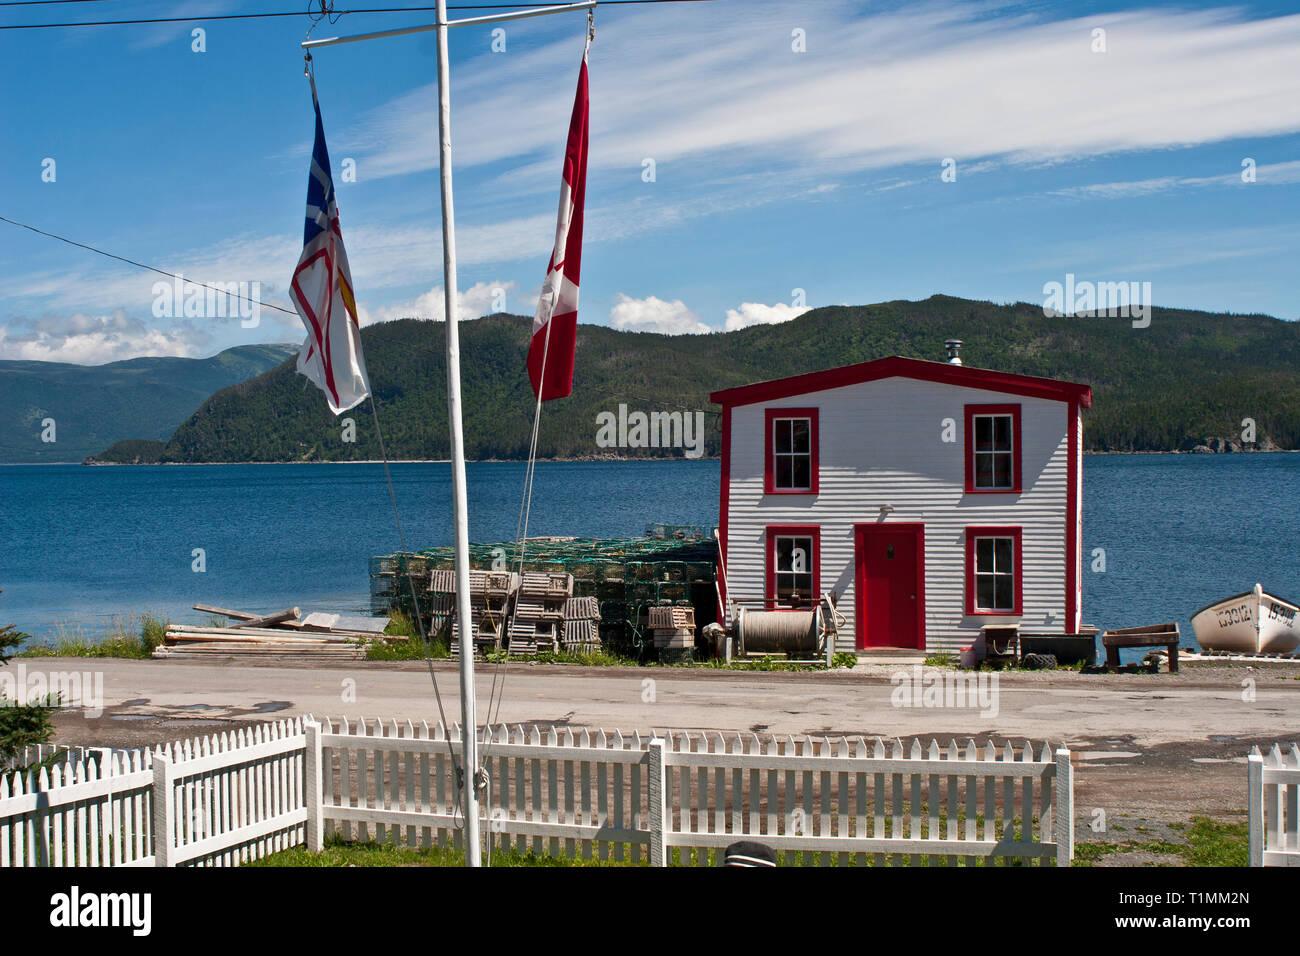 Newfoundland, Bonne Bay, Woody Point, Roberts Store - Stock Image